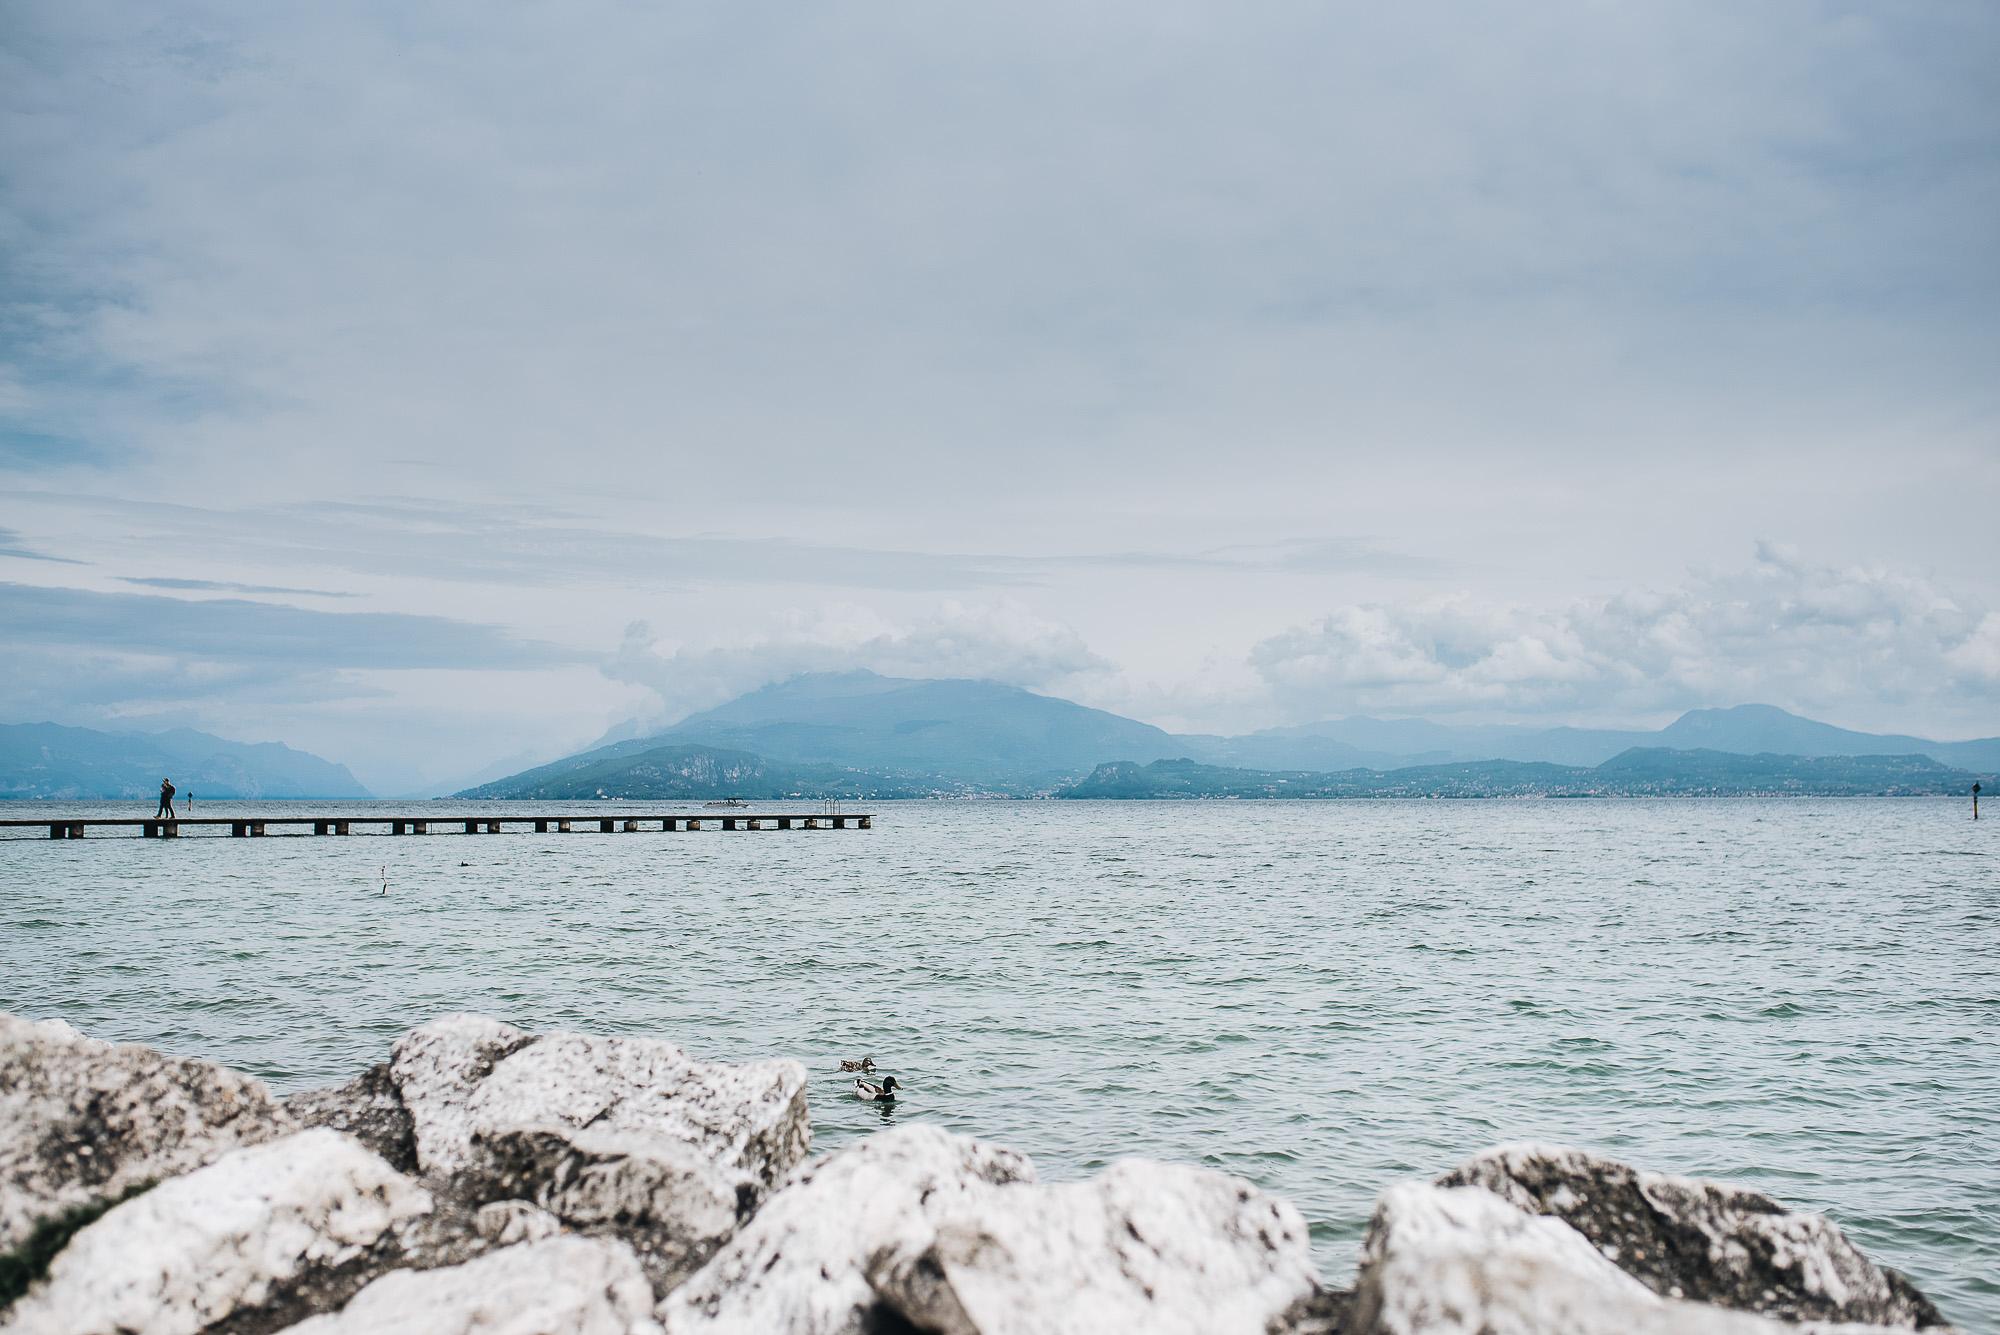 OurBeautifulAdventure-LakeGarda-Italy-Blog-0815.jpg